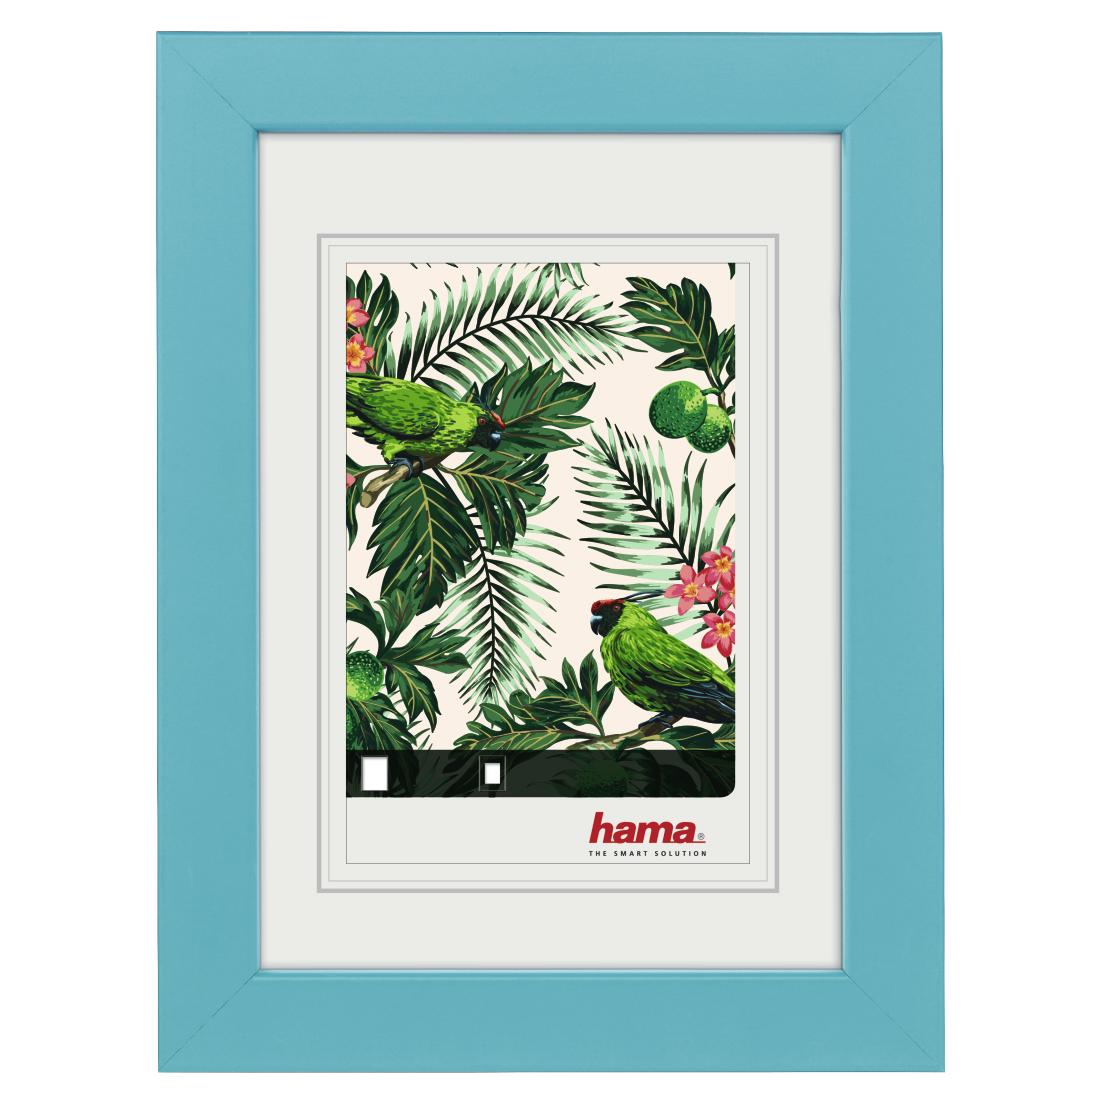 00175352 Hama Holzrahmen Tropical Türkis 10 X 15 Cm Hama De